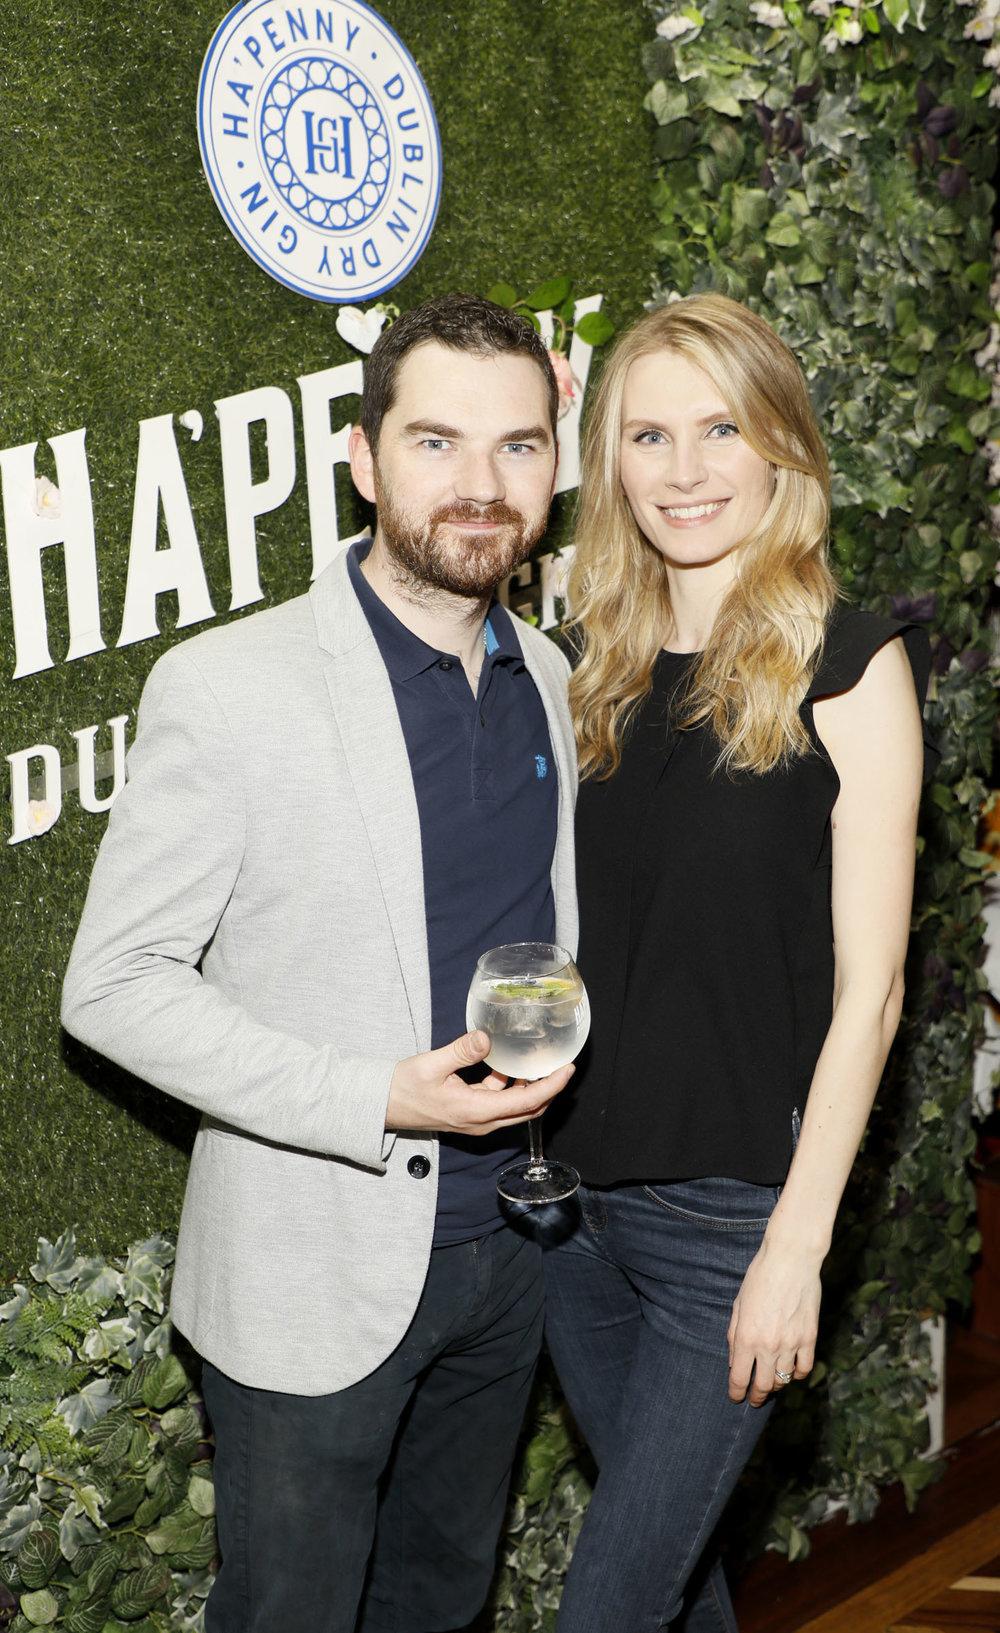 John and Agneta Crean at the launch of the Ha'penny Spirits range.jpg